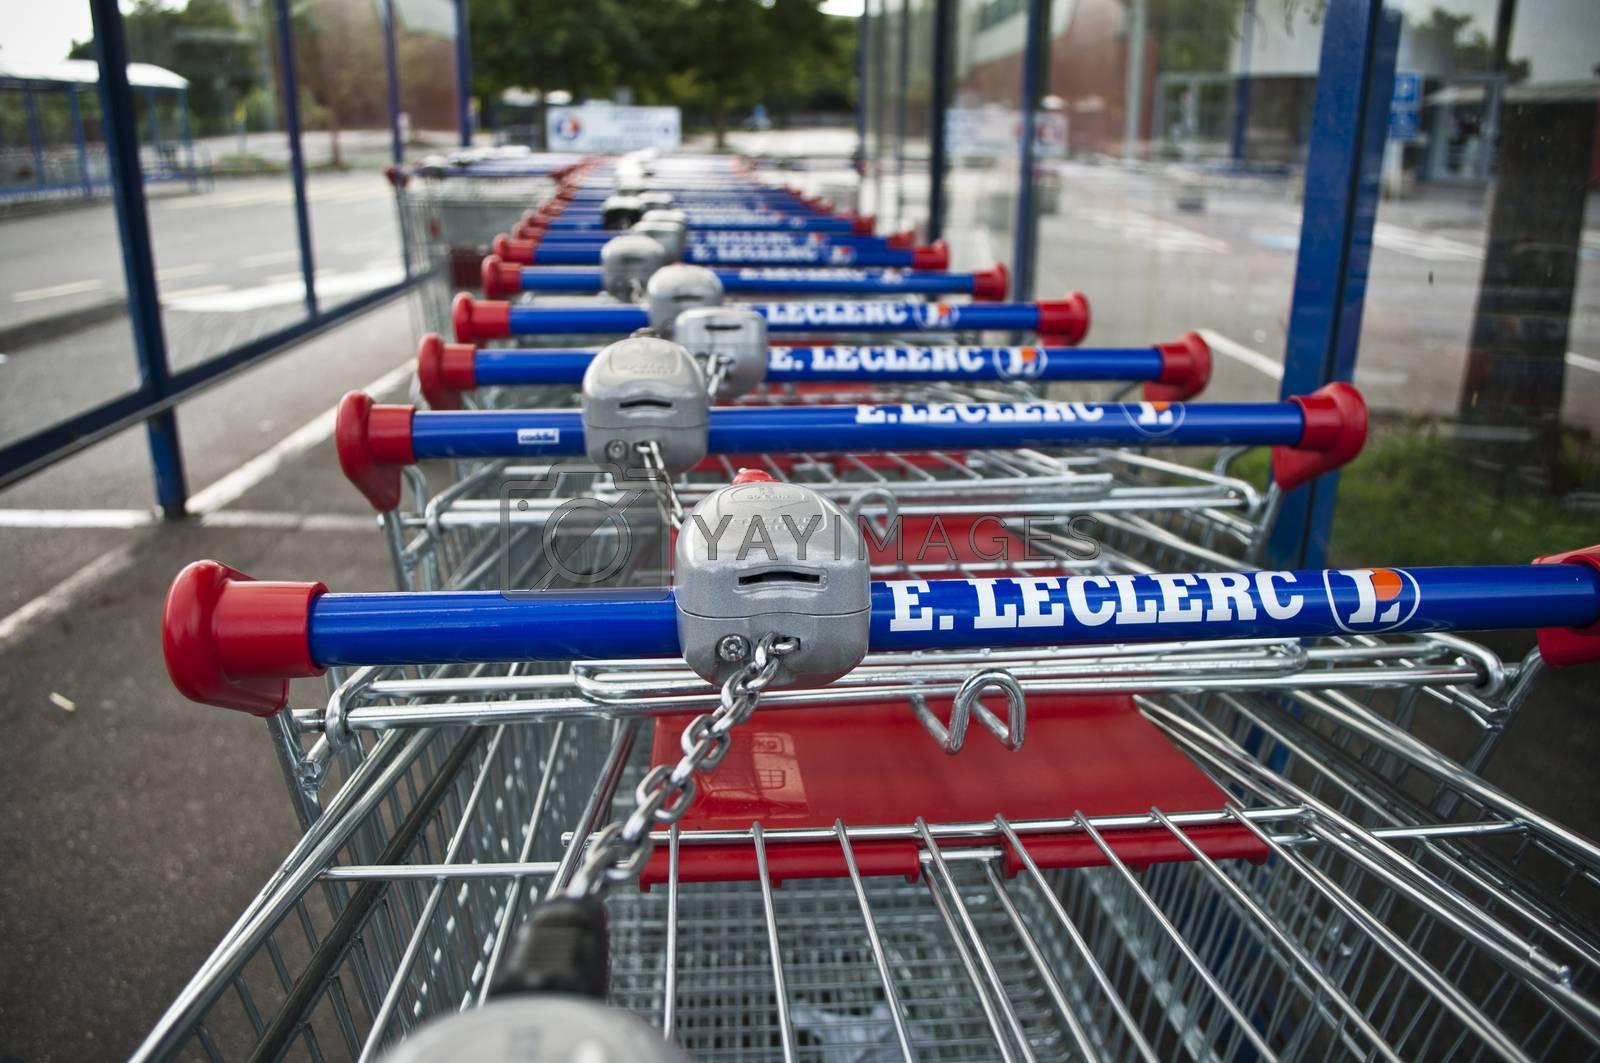 Royalty free image of market's trolleys in Lecrercq Market by NeydtStock